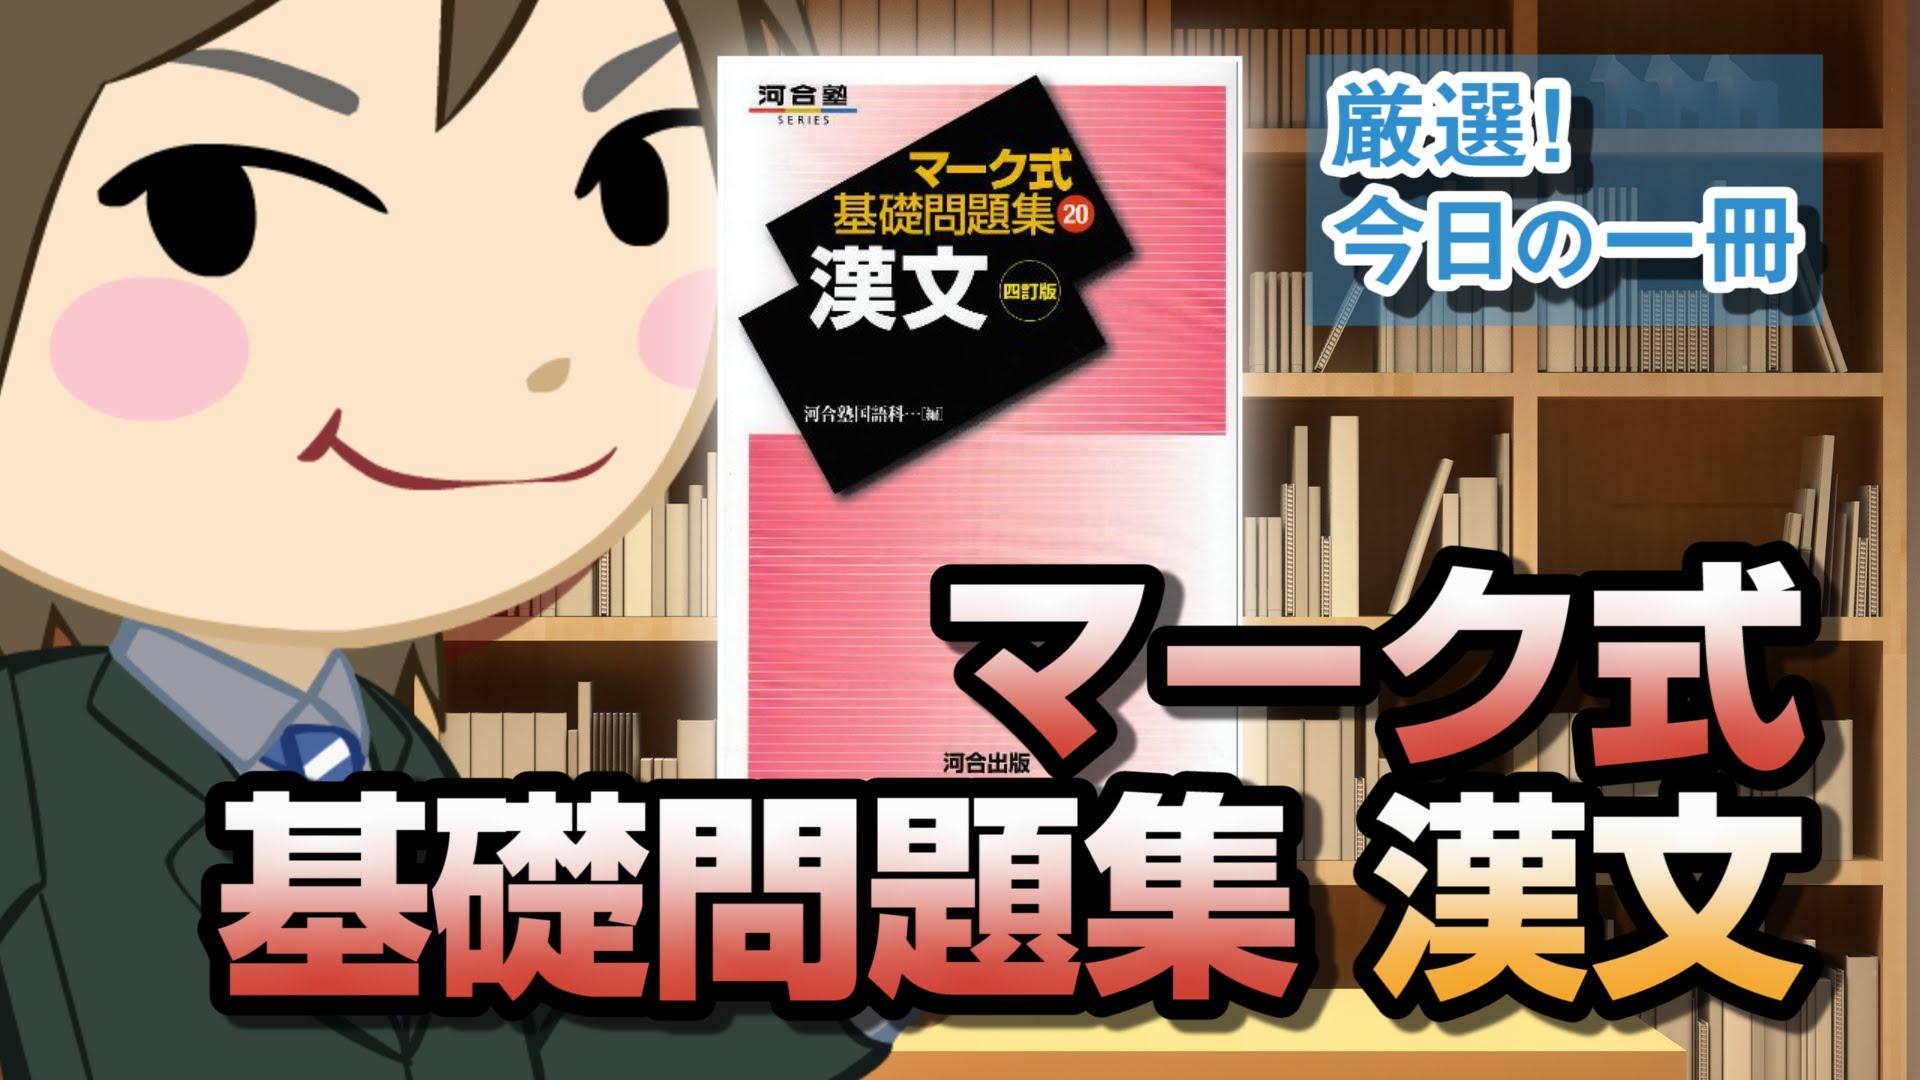 マーク式基礎問題集 20 漢文 武田塾厳選!今日の一冊